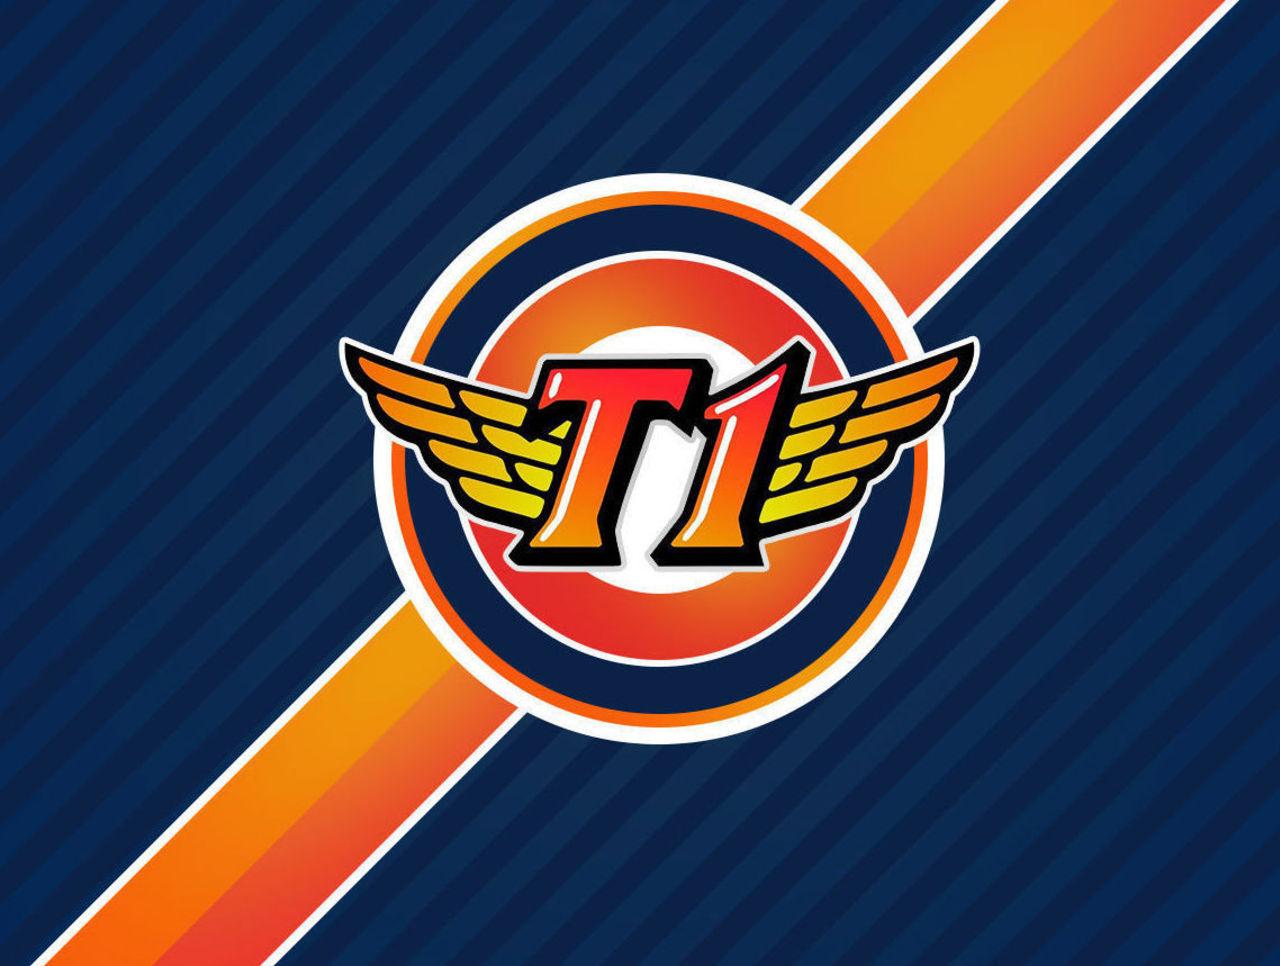 SK Telecom T1 Sign Duke TheScore Esports